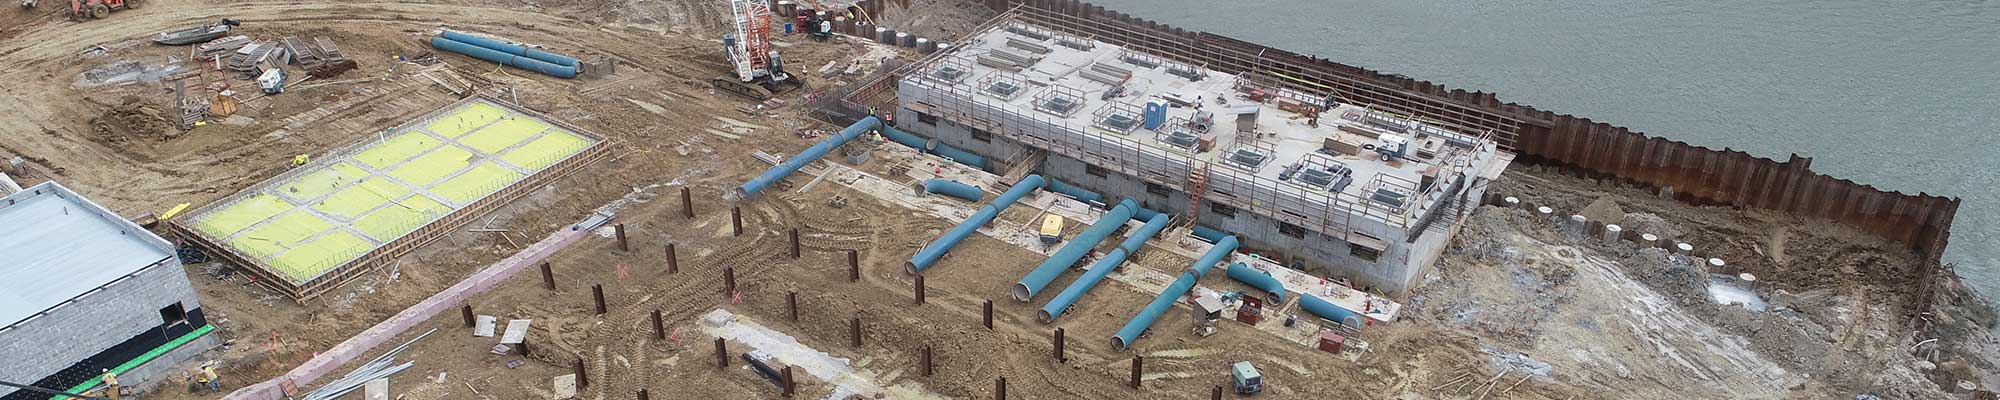 Luce Bayou Project - Feb 2020